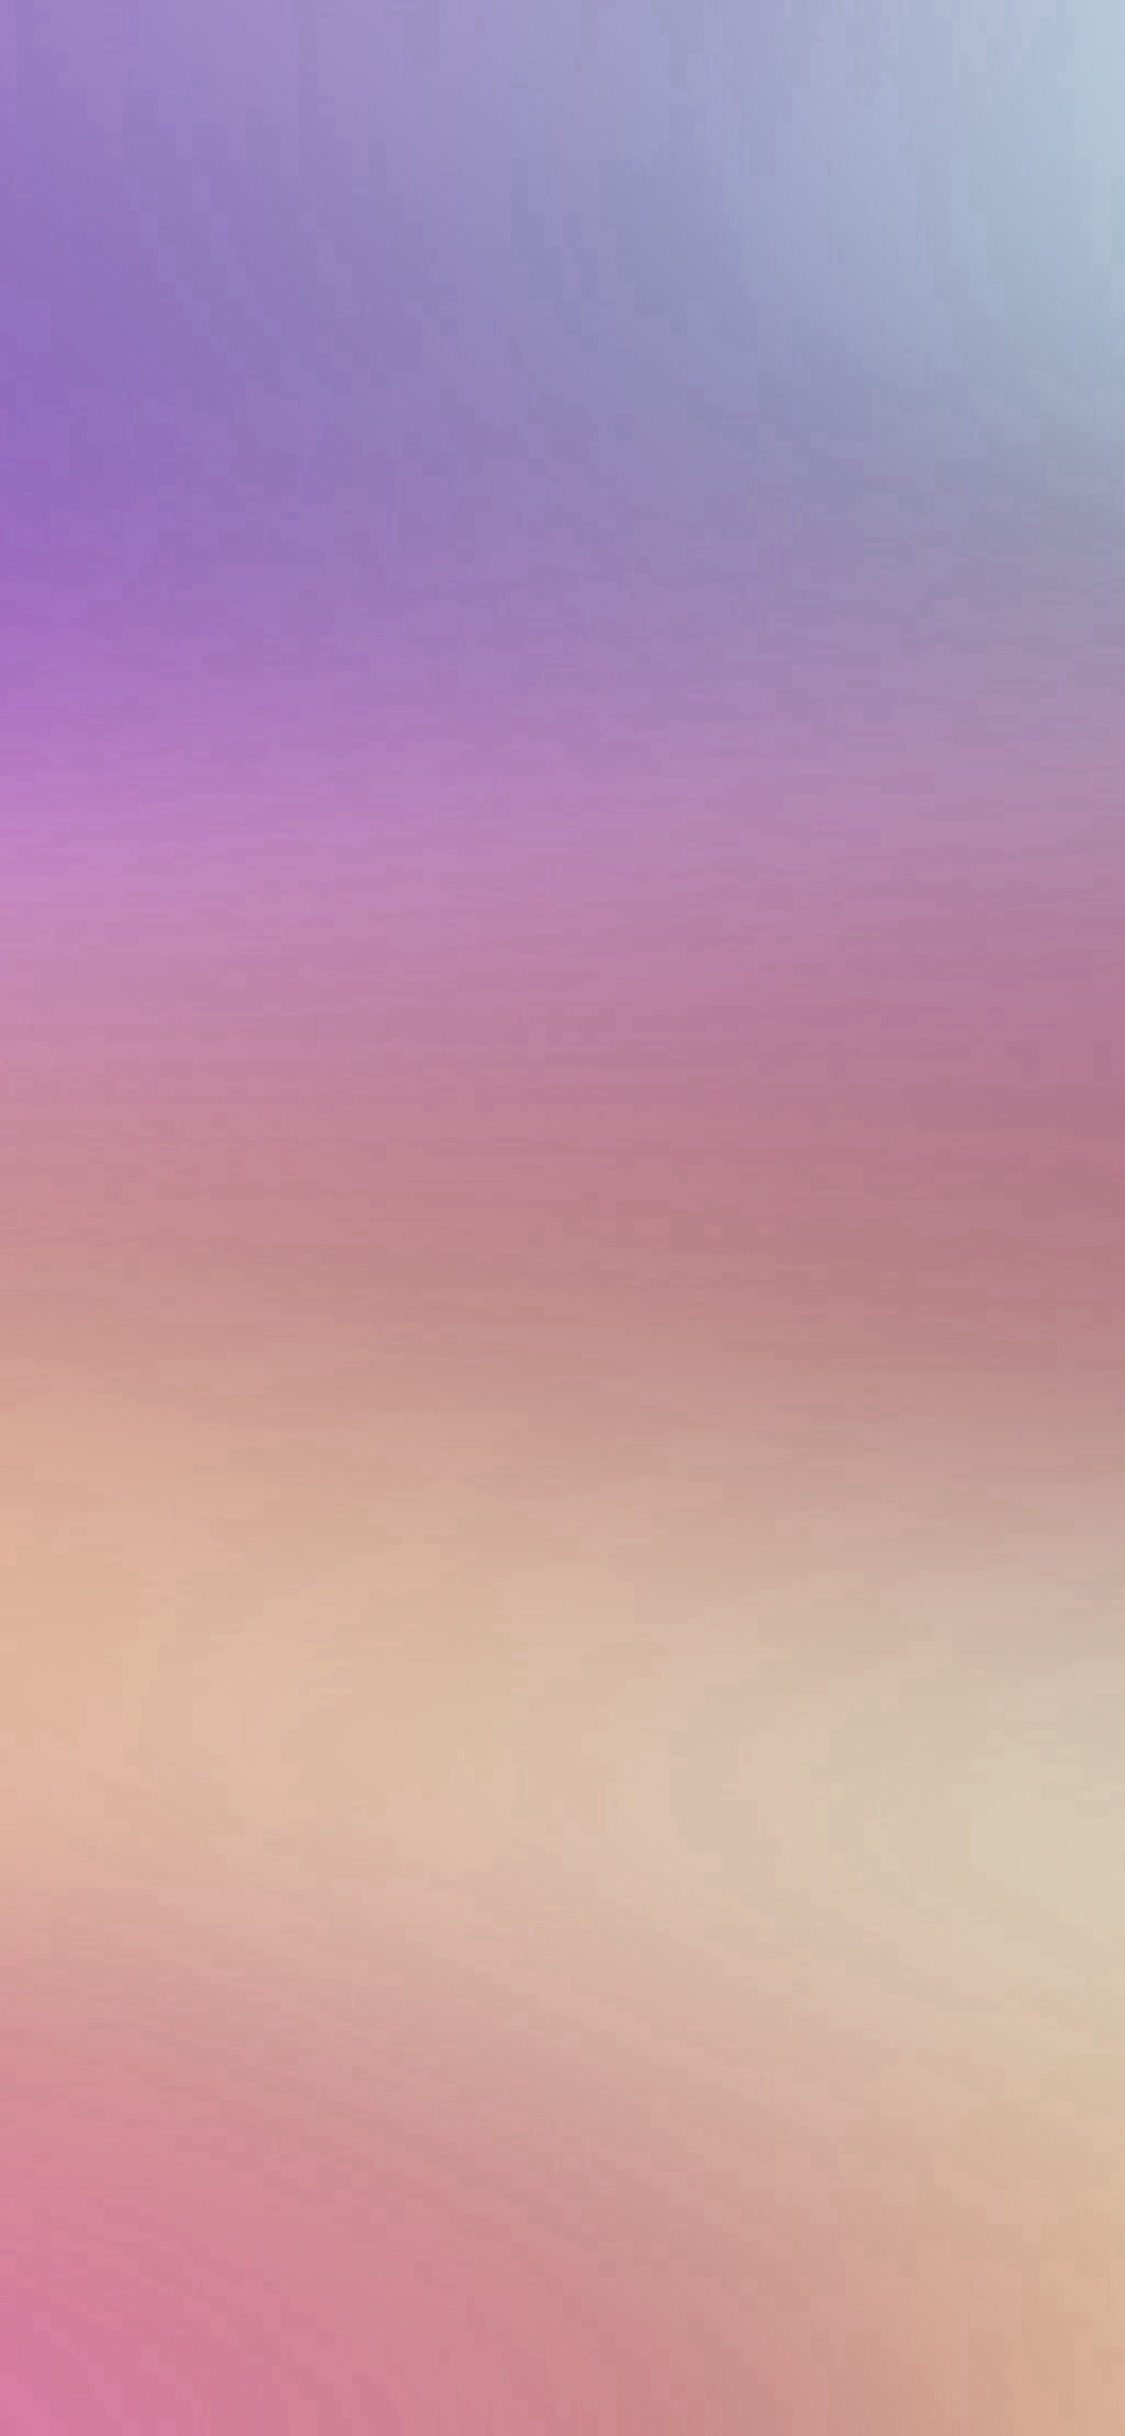 Best Blur Iphone X Wallpapers Hd Ilikewallpaper